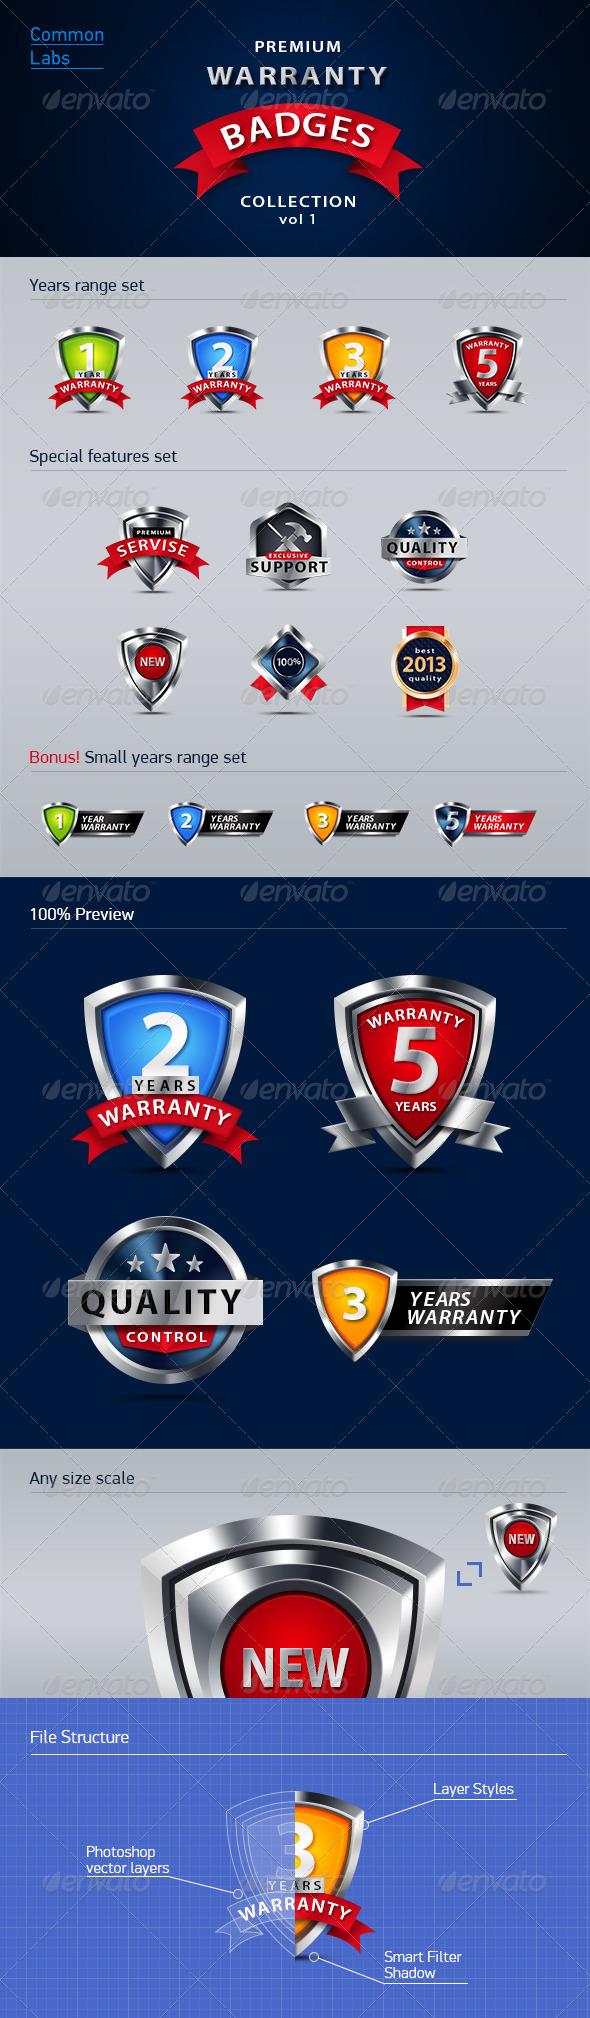 Premium Warranty Badges Collection Vol. 1 - Badges & Stickers Web Elements